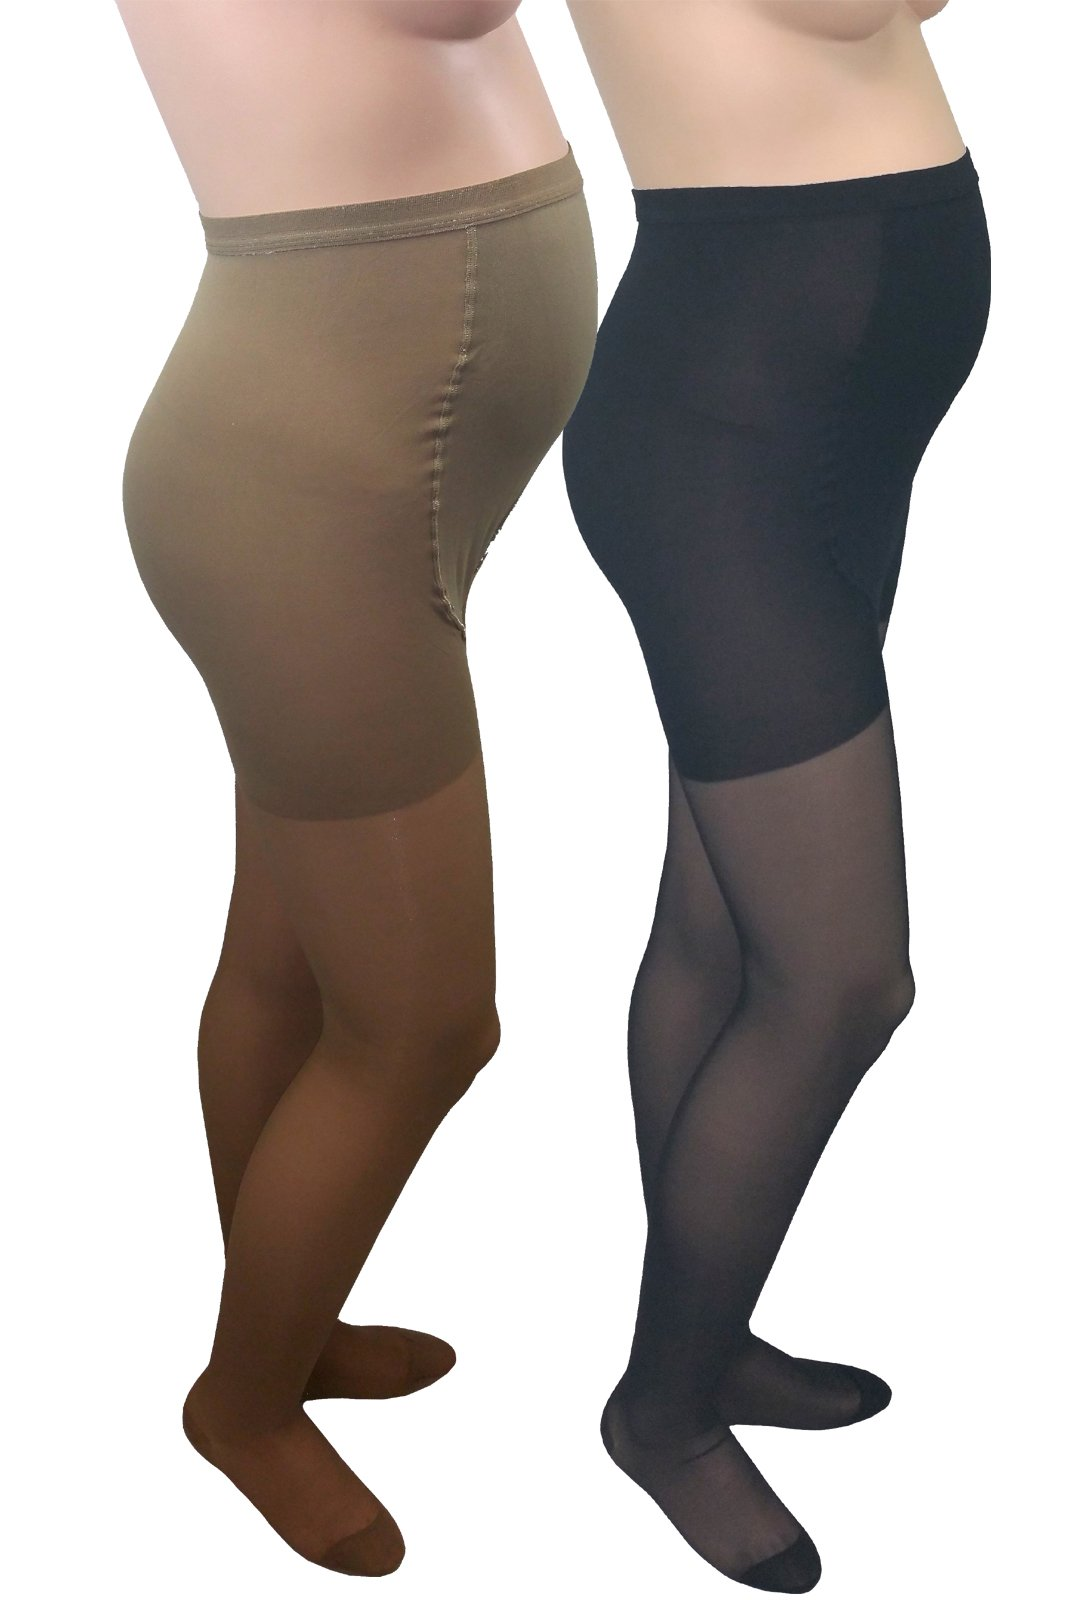 GABRIALLA Maternity Graduated Compression Pantyhose 2 Pack (20-22 mmHg) H-260: Medium Beige/Black